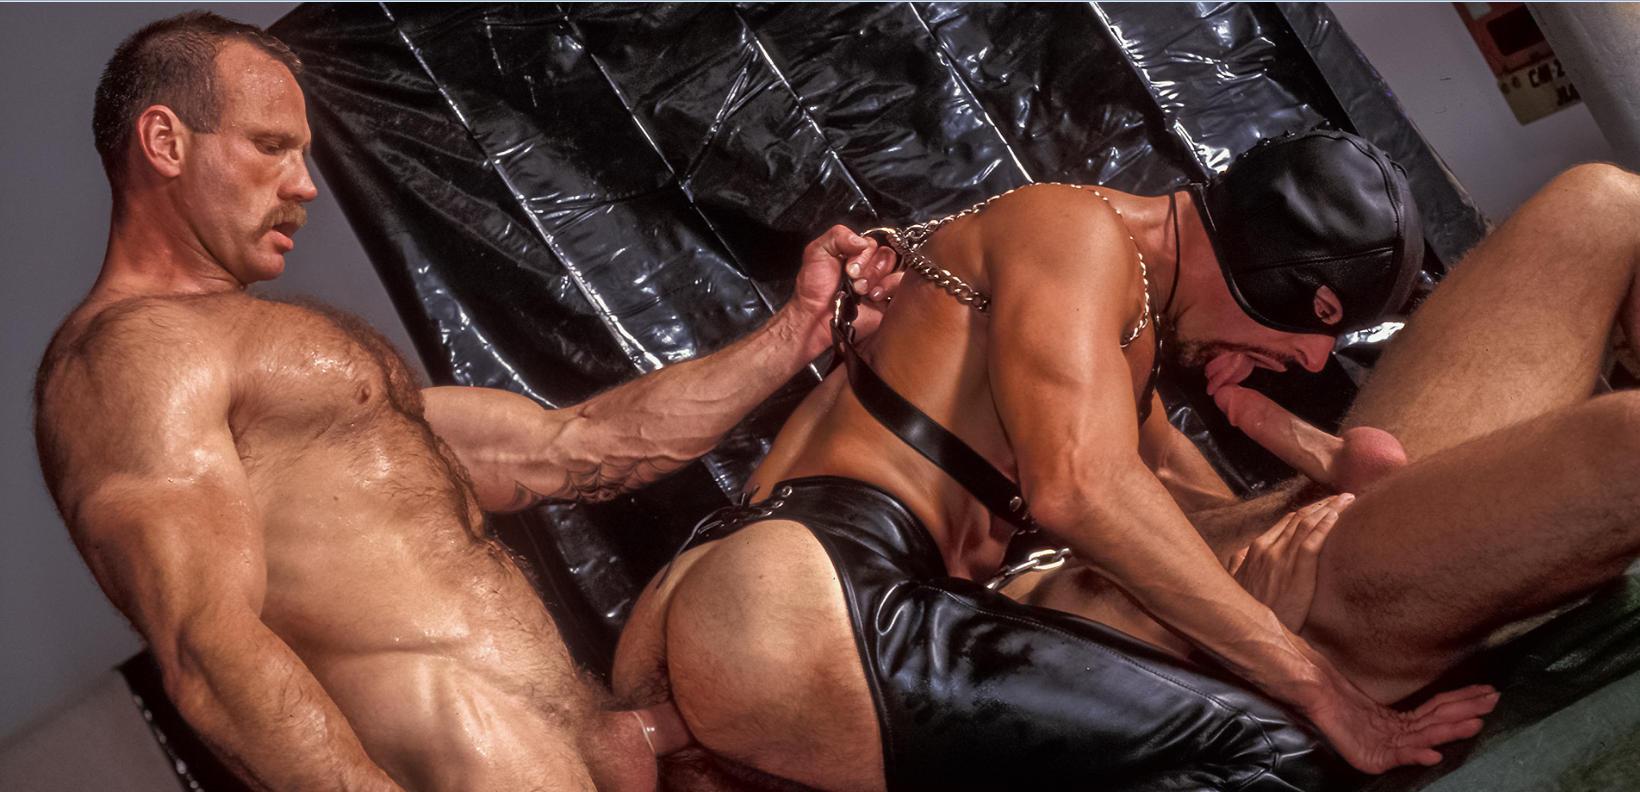 Black men in leather porn